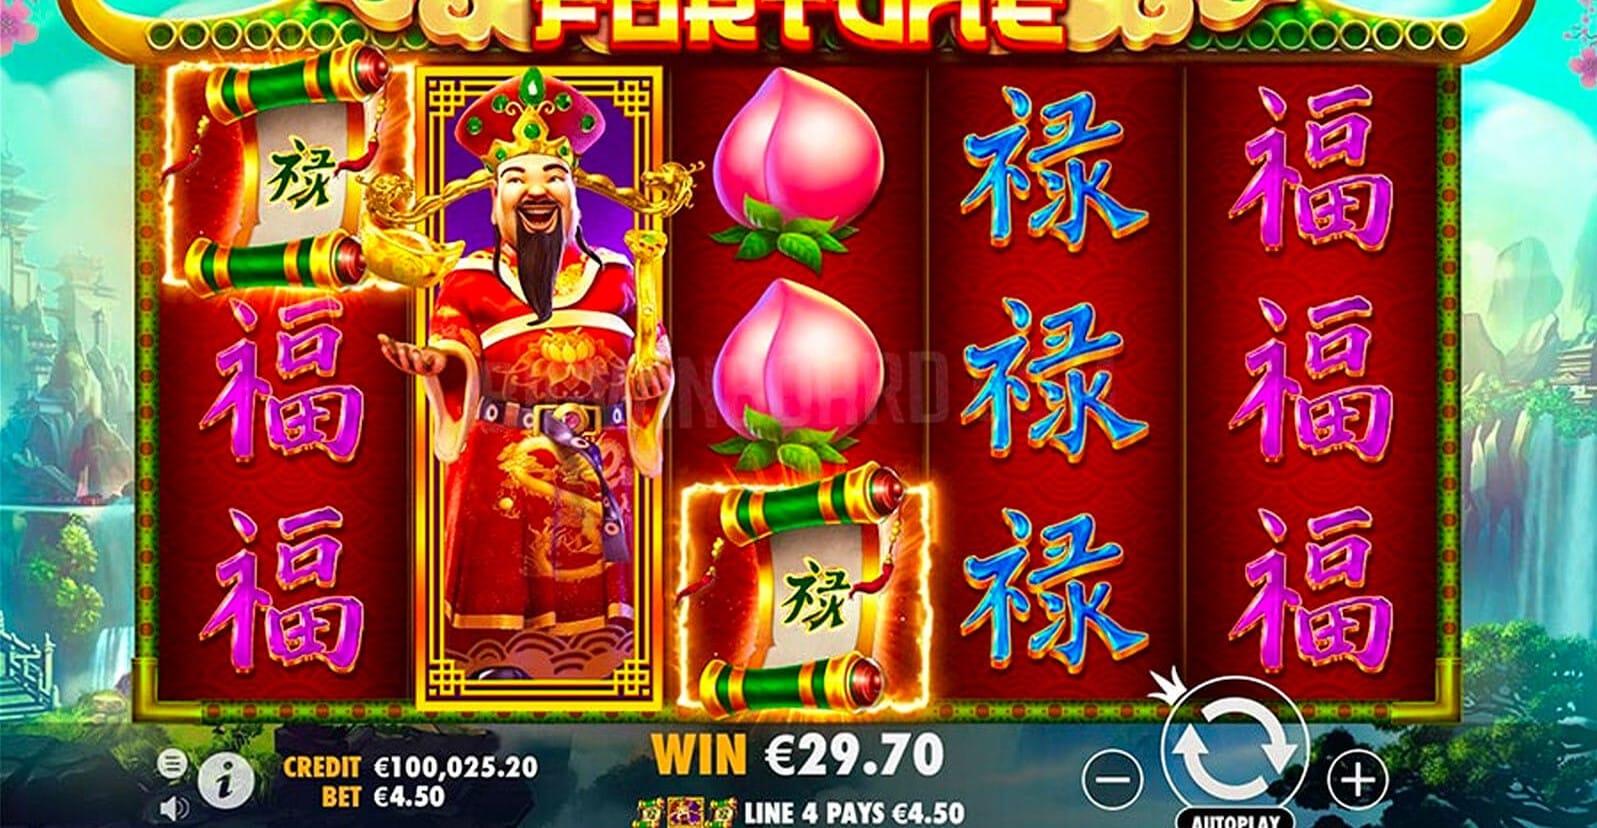 Three Star Fortune Slots Online